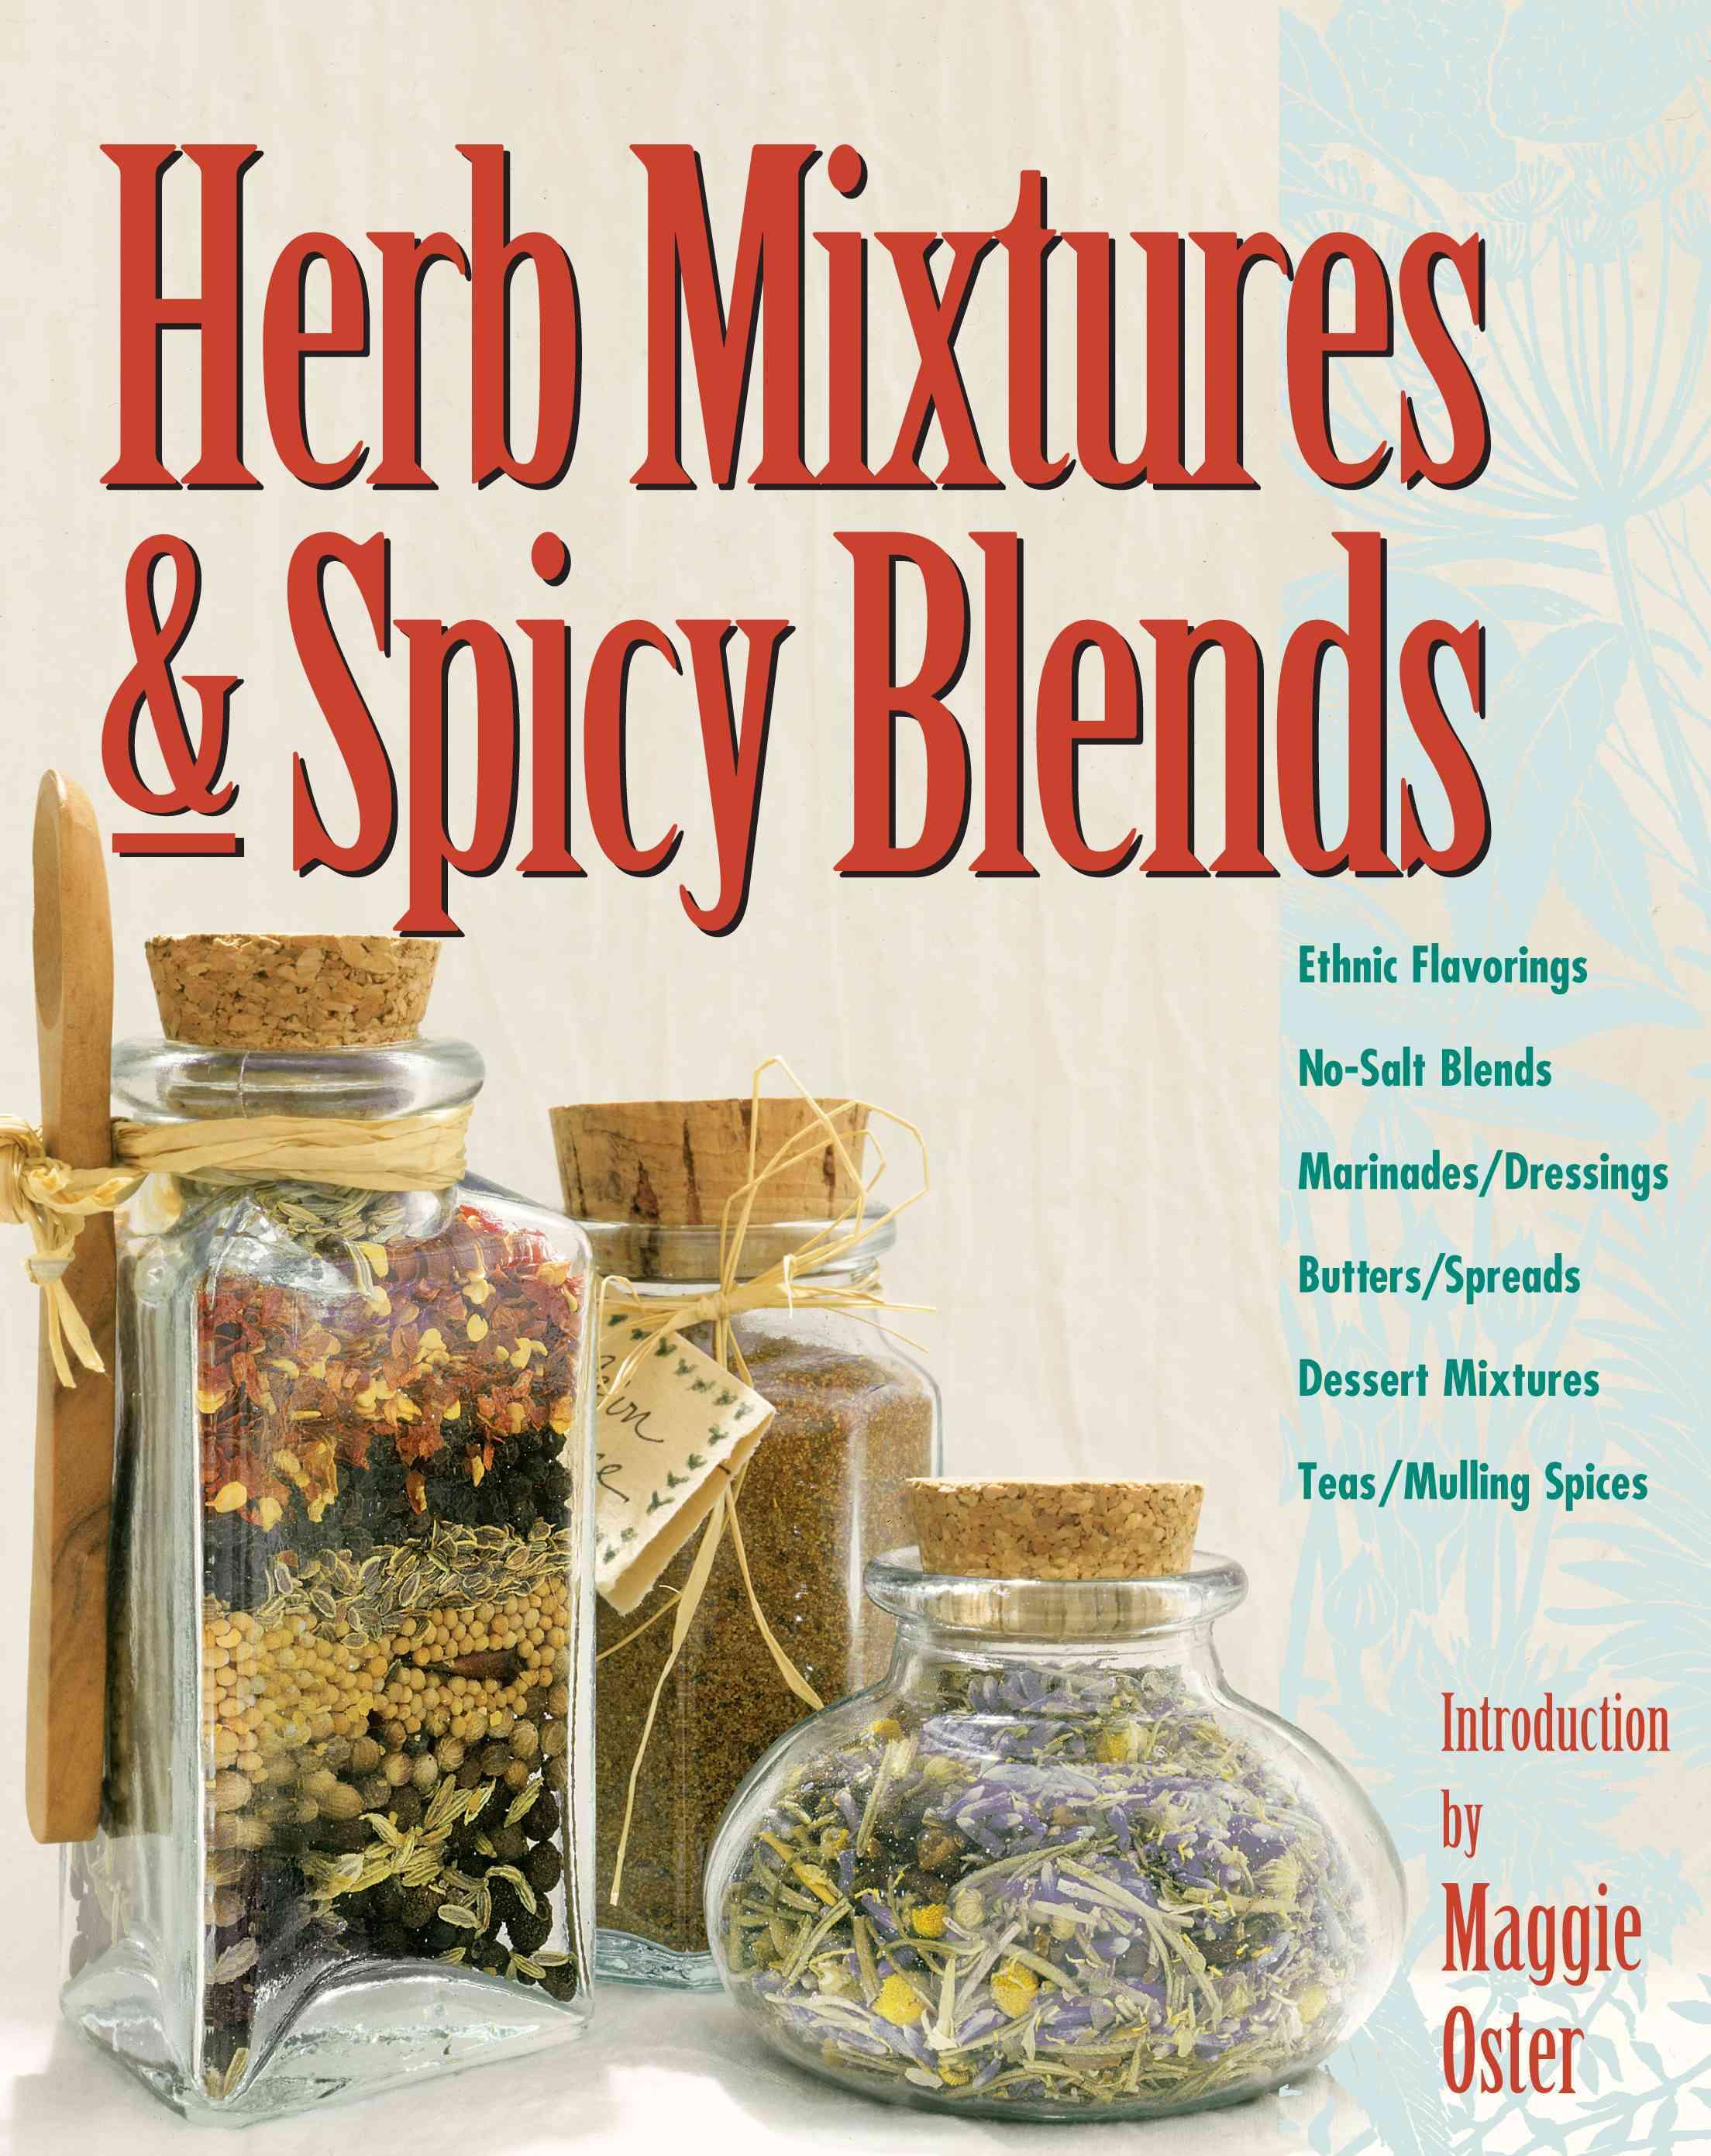 Herb Mixtures & Spicy Blends: Ethnic Flavorings, No-salt Blends, Marinades/dressings, Butters/spreads, Dessert Mi... (Paperback)